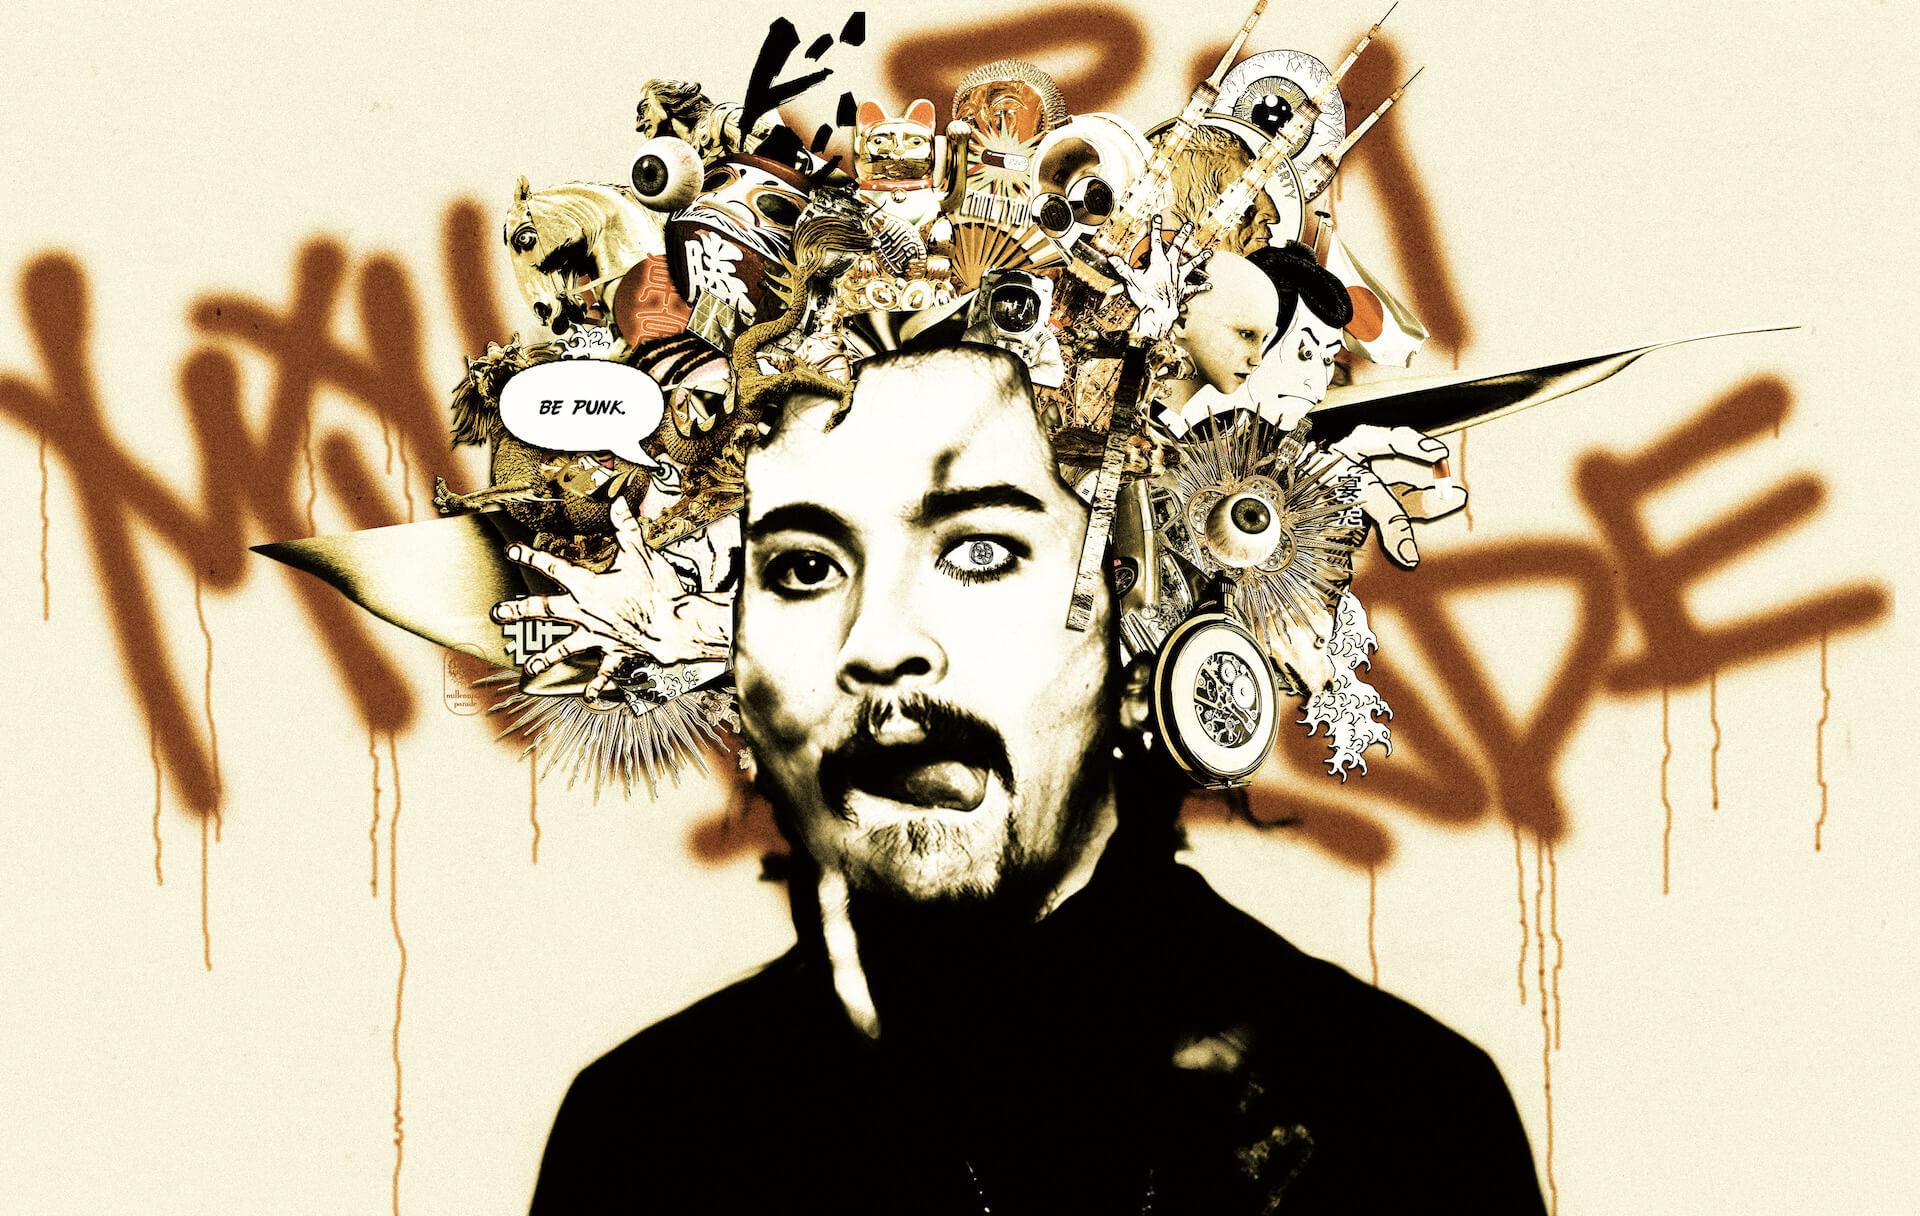 King Gnu常田大希のソロプロジェクト・millennium paradeの1stアルバムがリリース決定!3Dライブの開催も発表 music201125_millenniumparade_3